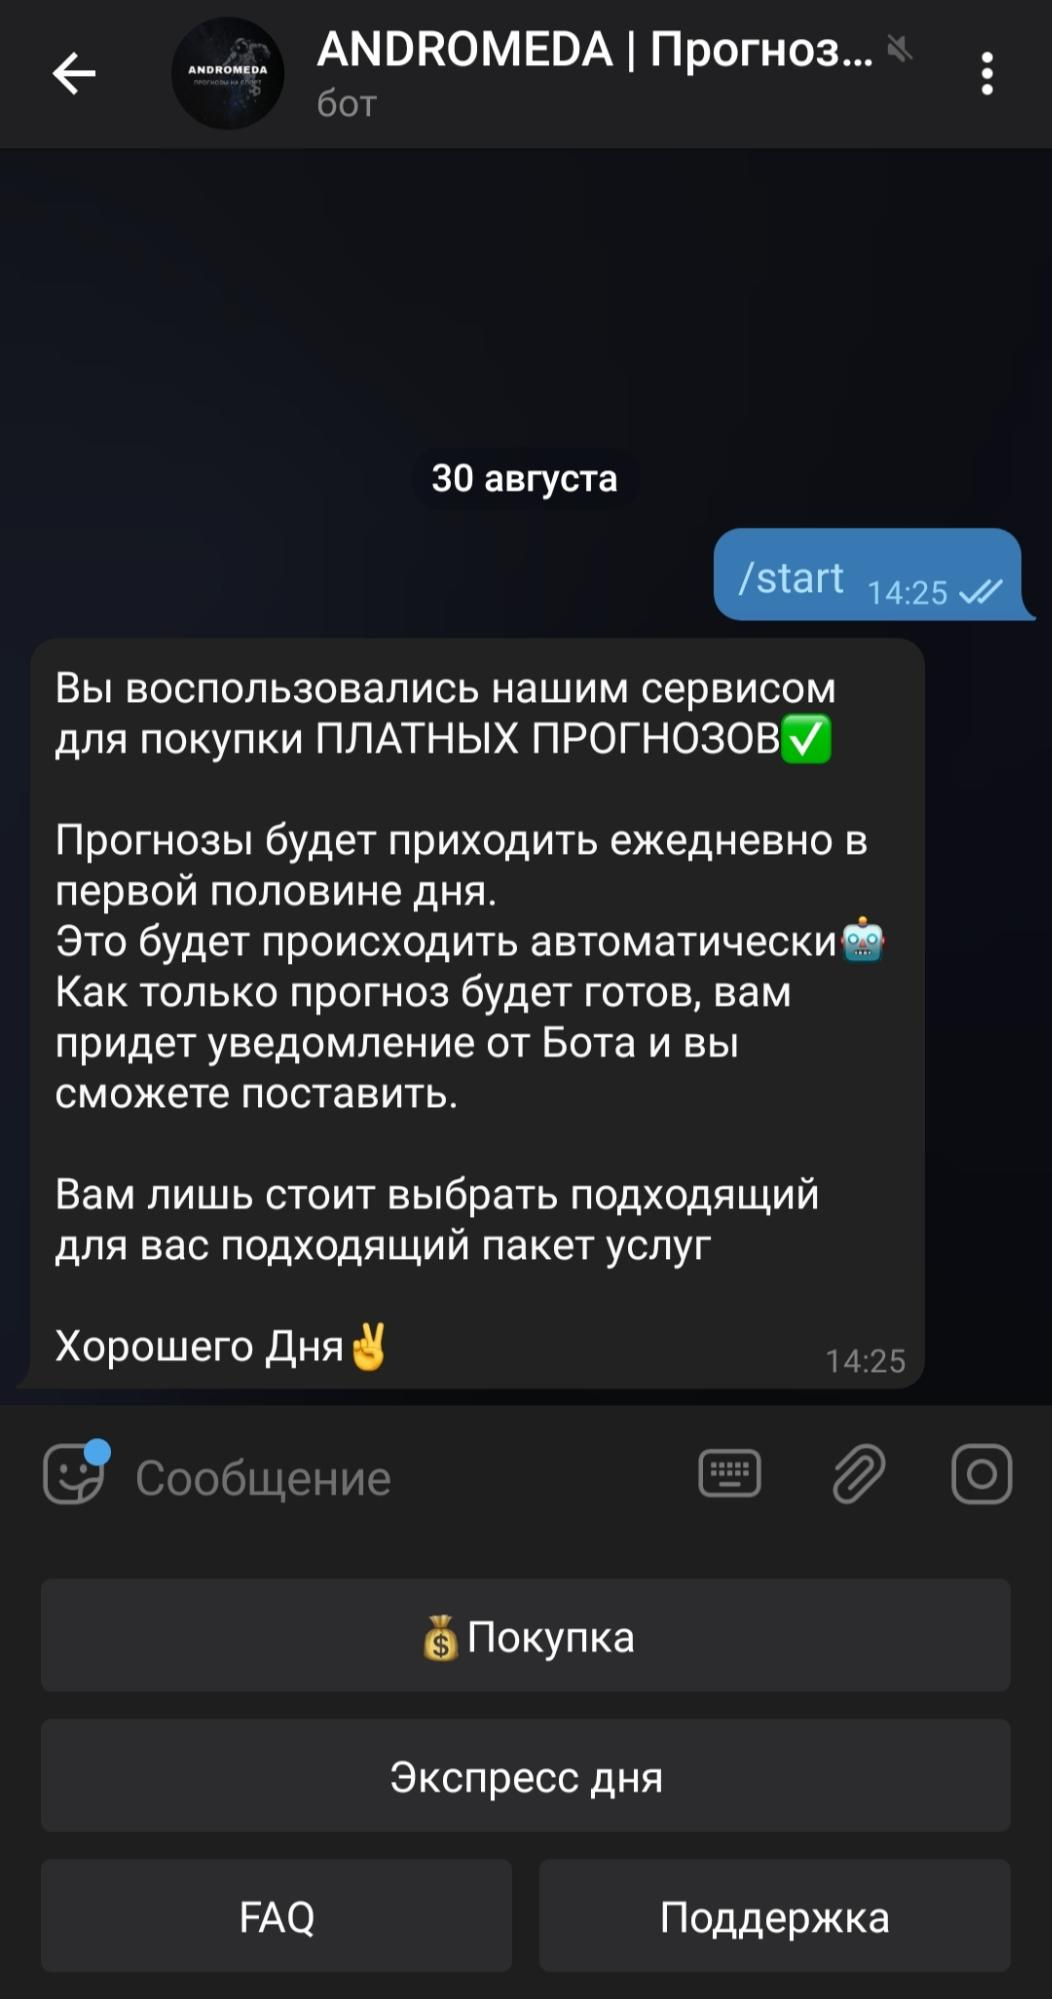 Меню бота Андромеда Телеграмм